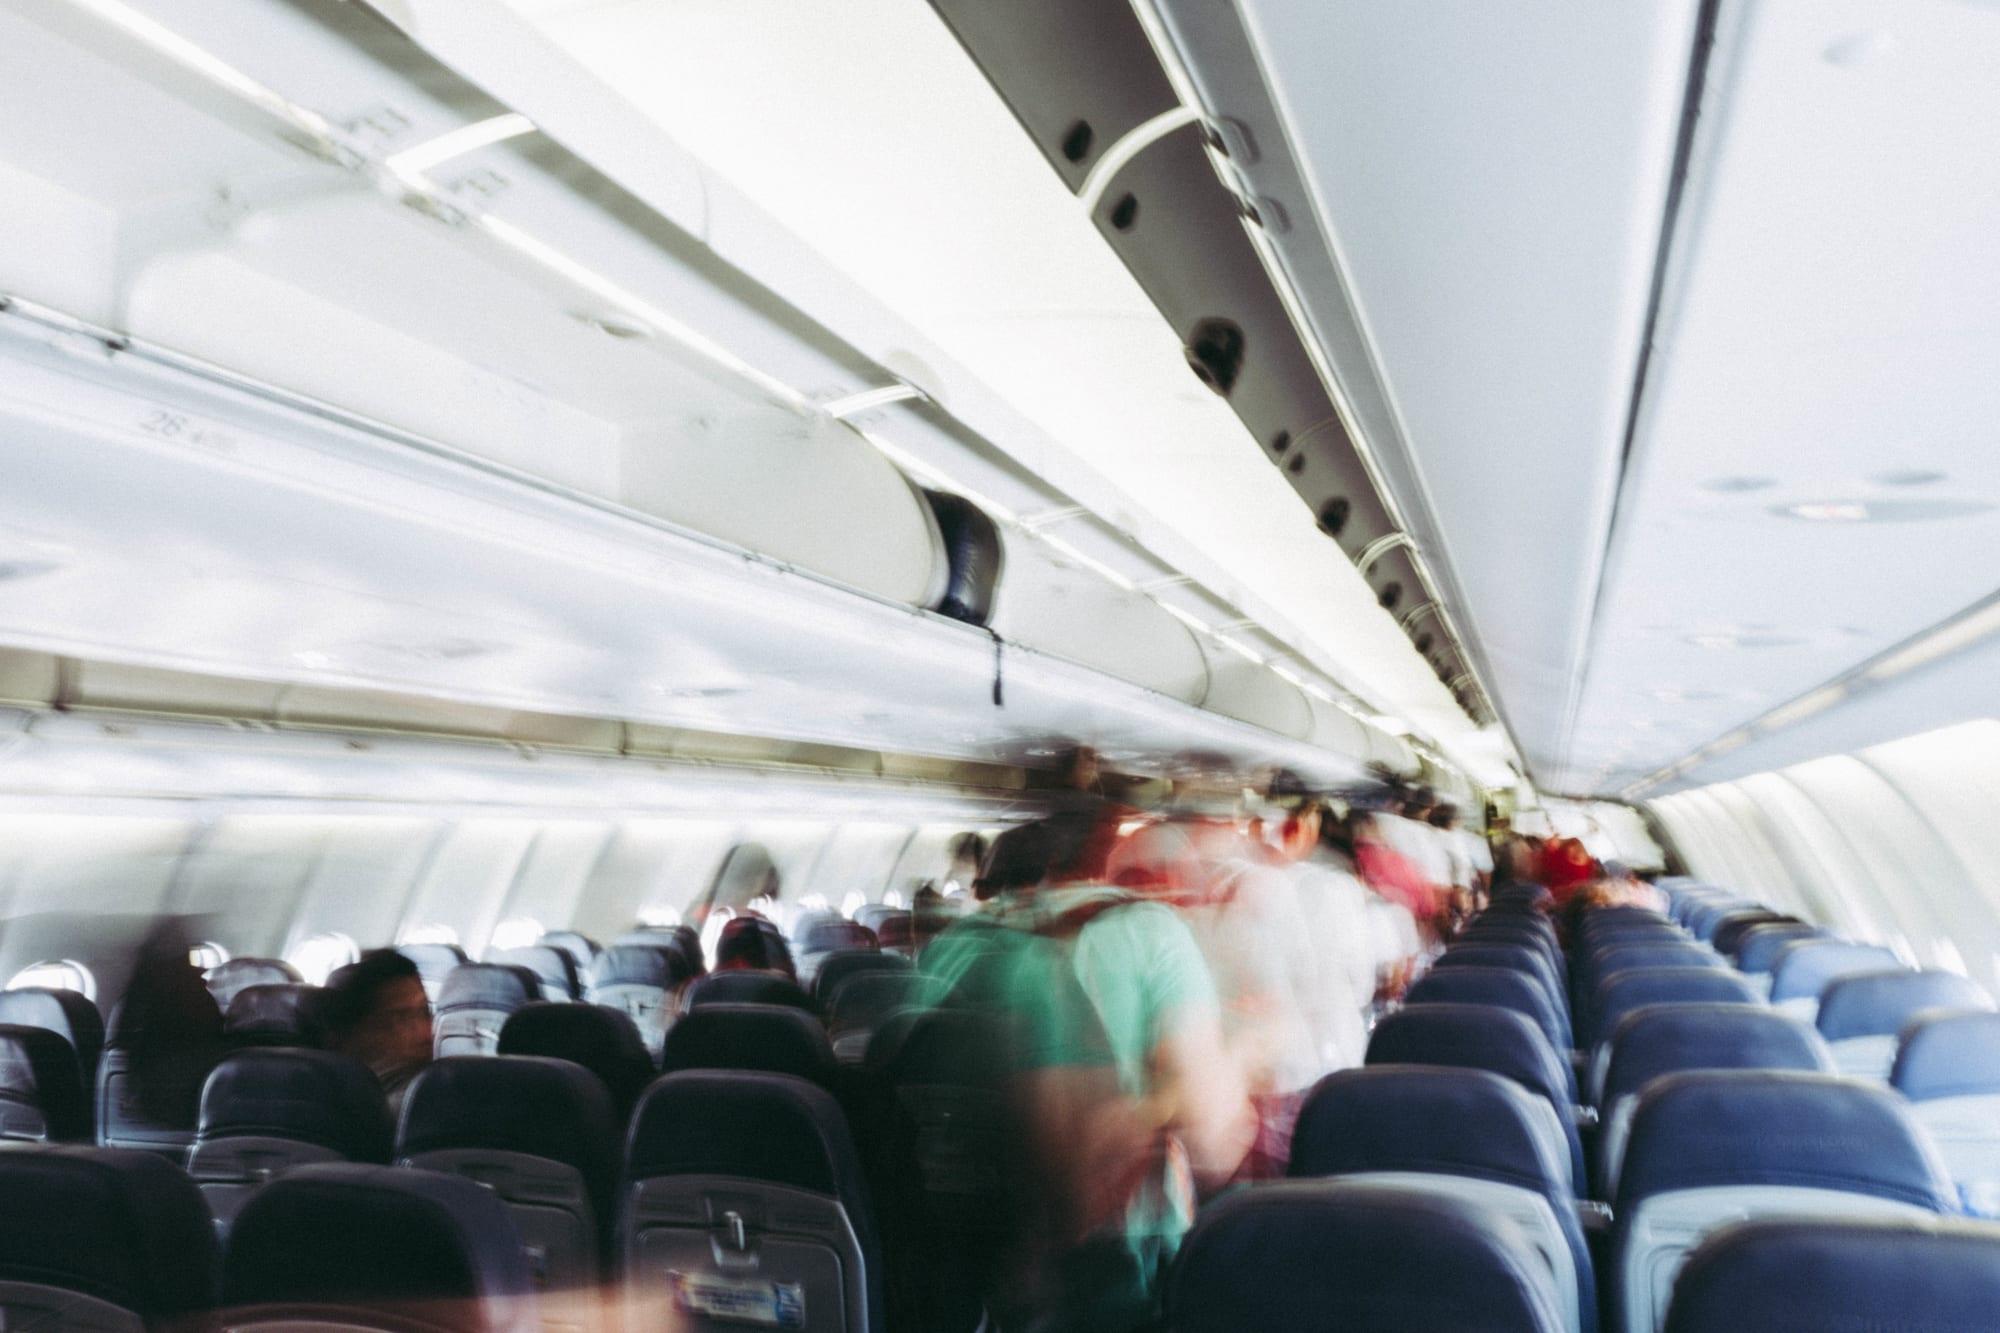 IATF Approved Uniform Travel Protocol